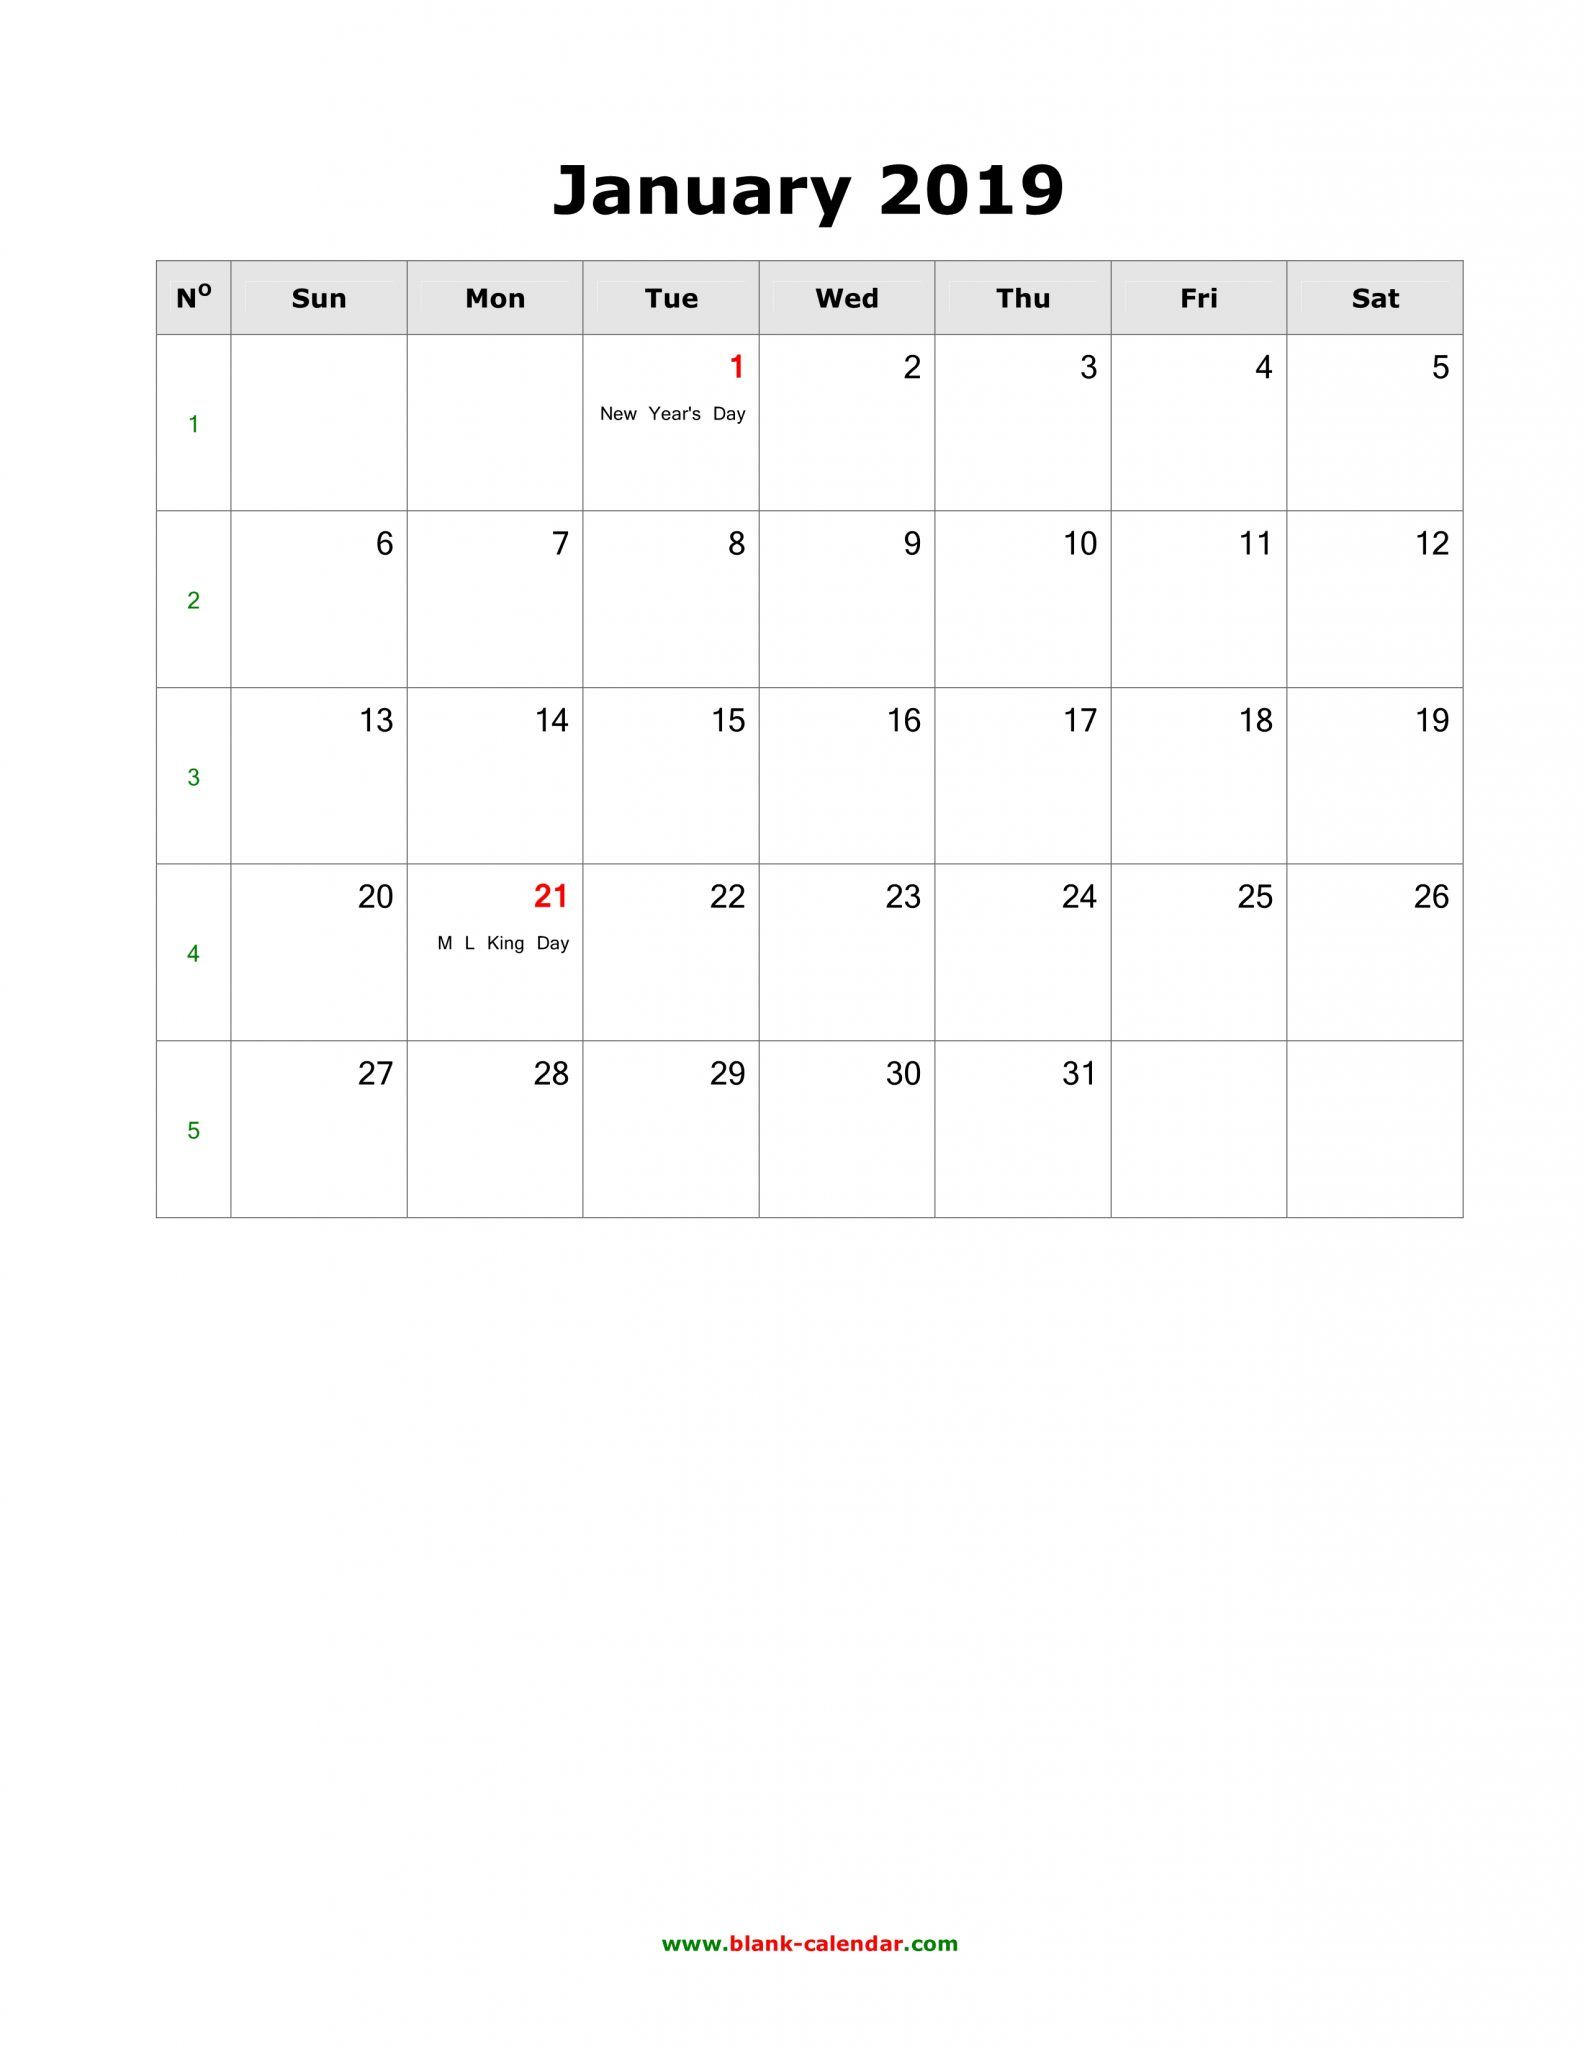 January 2019 Portrait Calendar Blank January 2019 Calendar